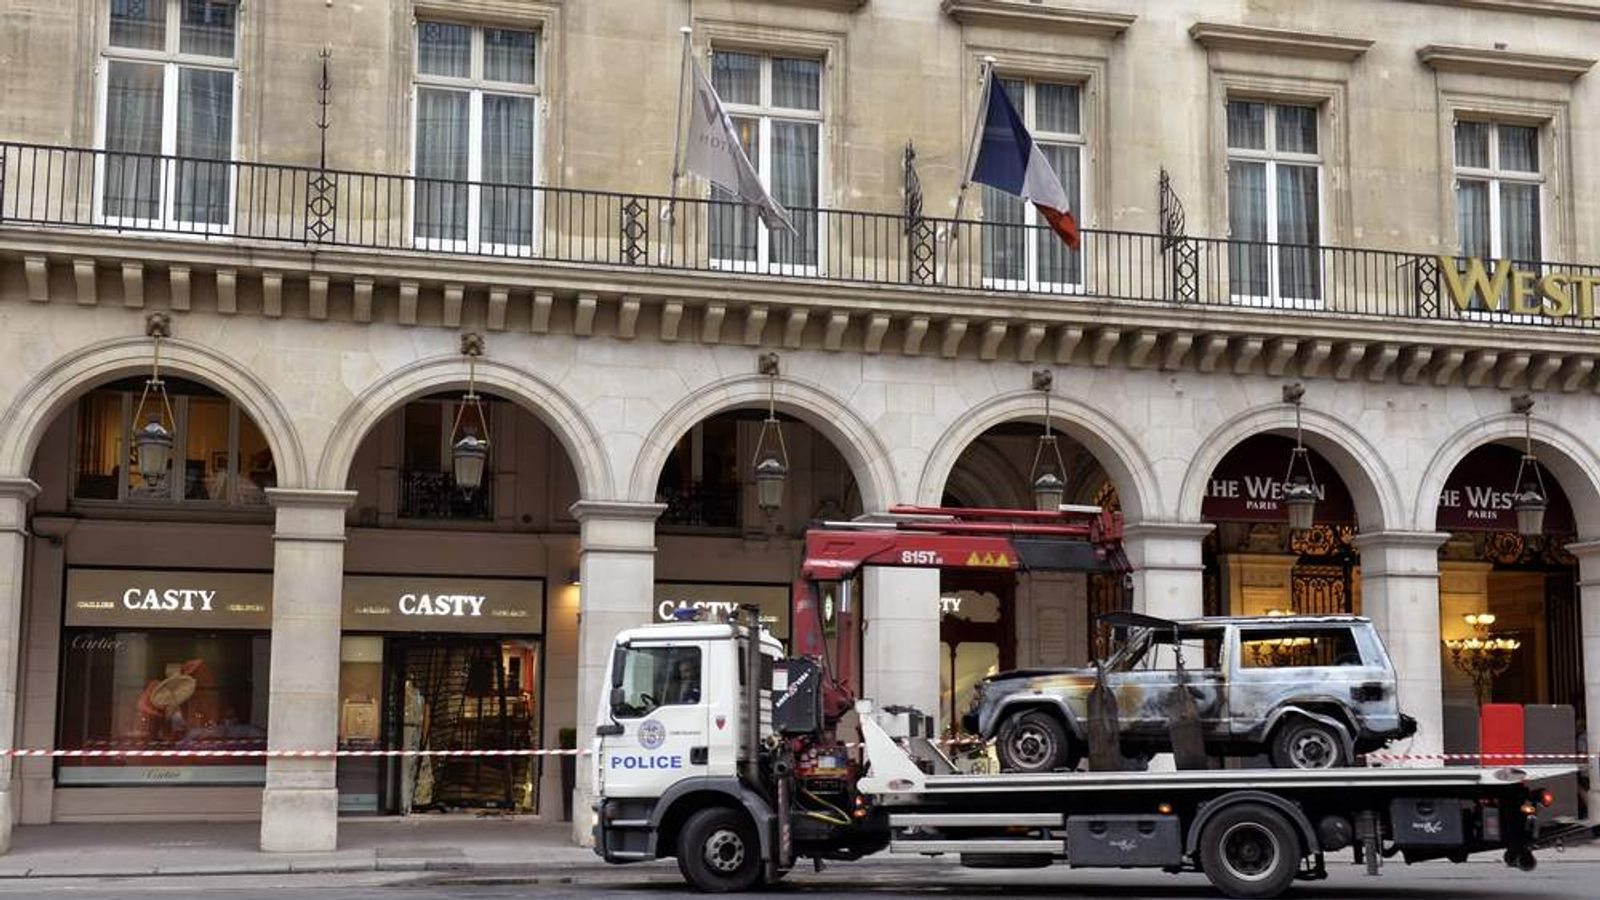 FRANCE-CRIME-RAM-RAID Casty Paris